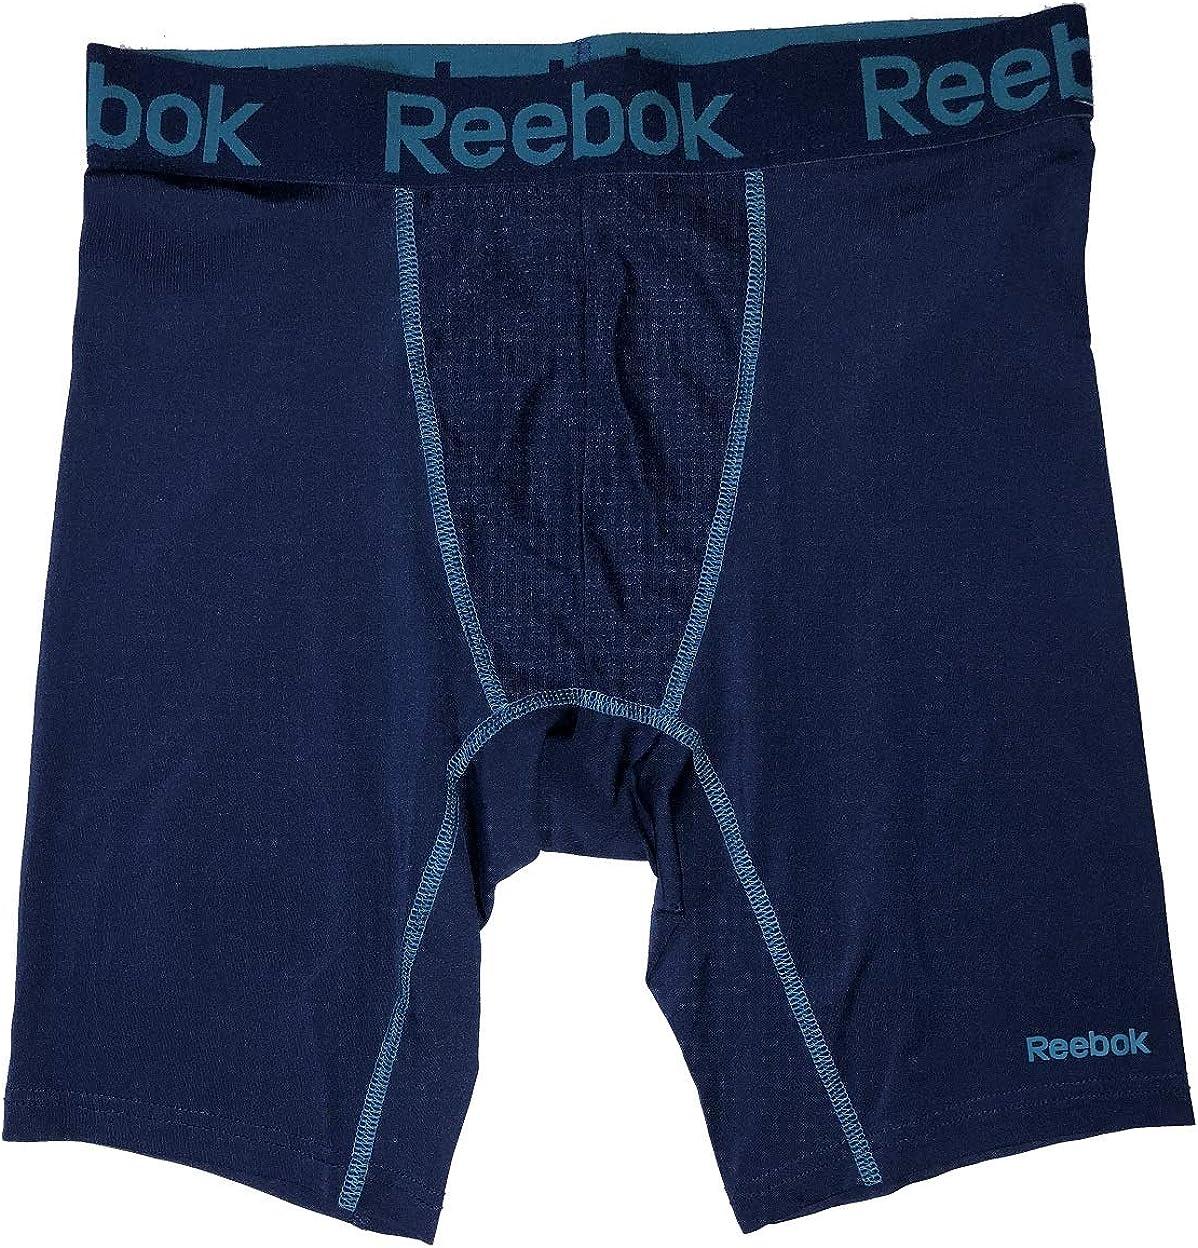 Reebok Men's Performance Boxer Brief Brief